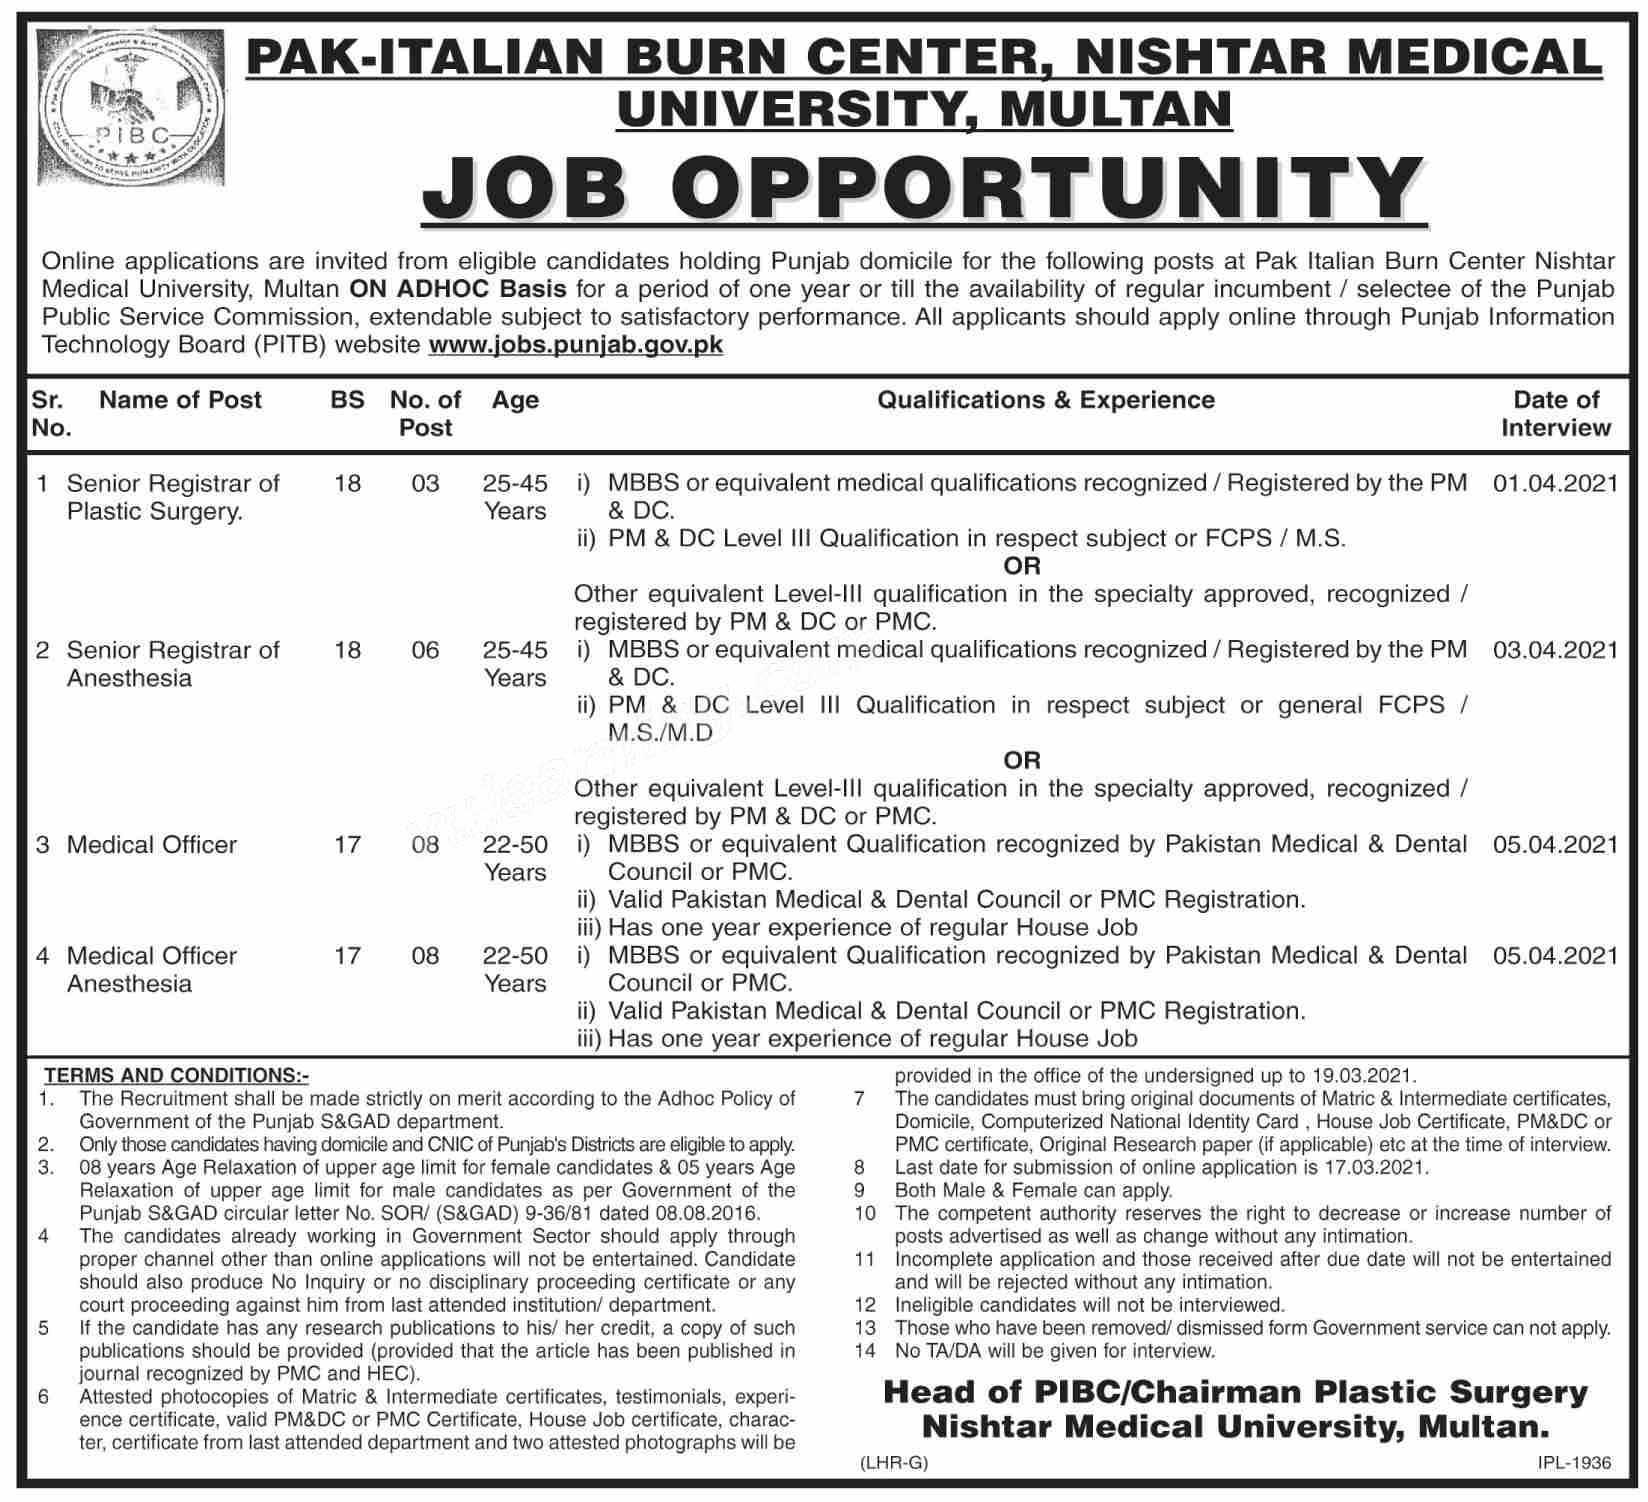 Nishtar Medical University Multan for Teacher Manager, Aya, Ward Boy Jobs 2021